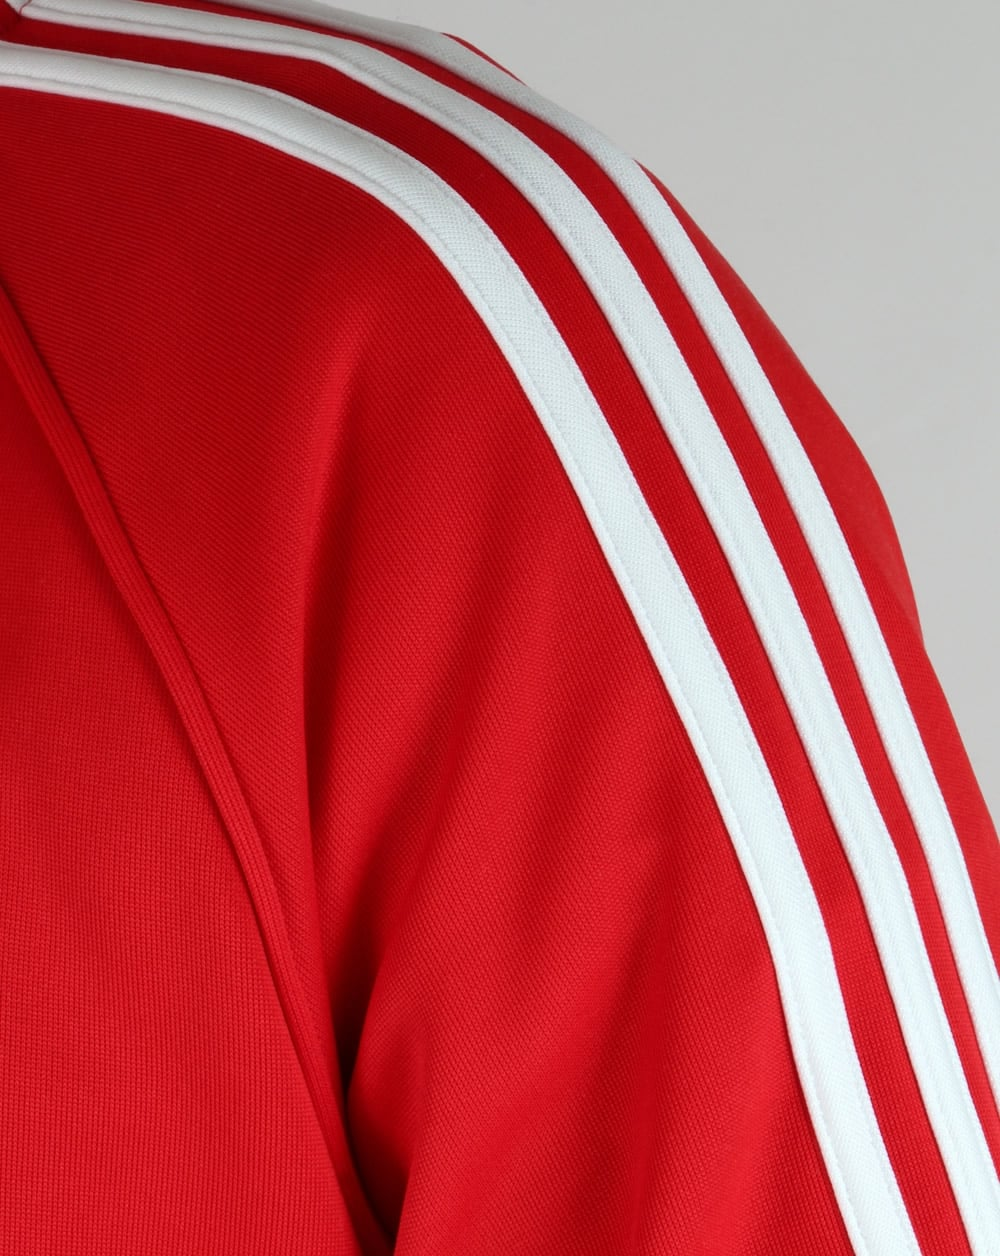 Adidas Chaqueta Para Hombre Súper Estrella Roja So42GLl